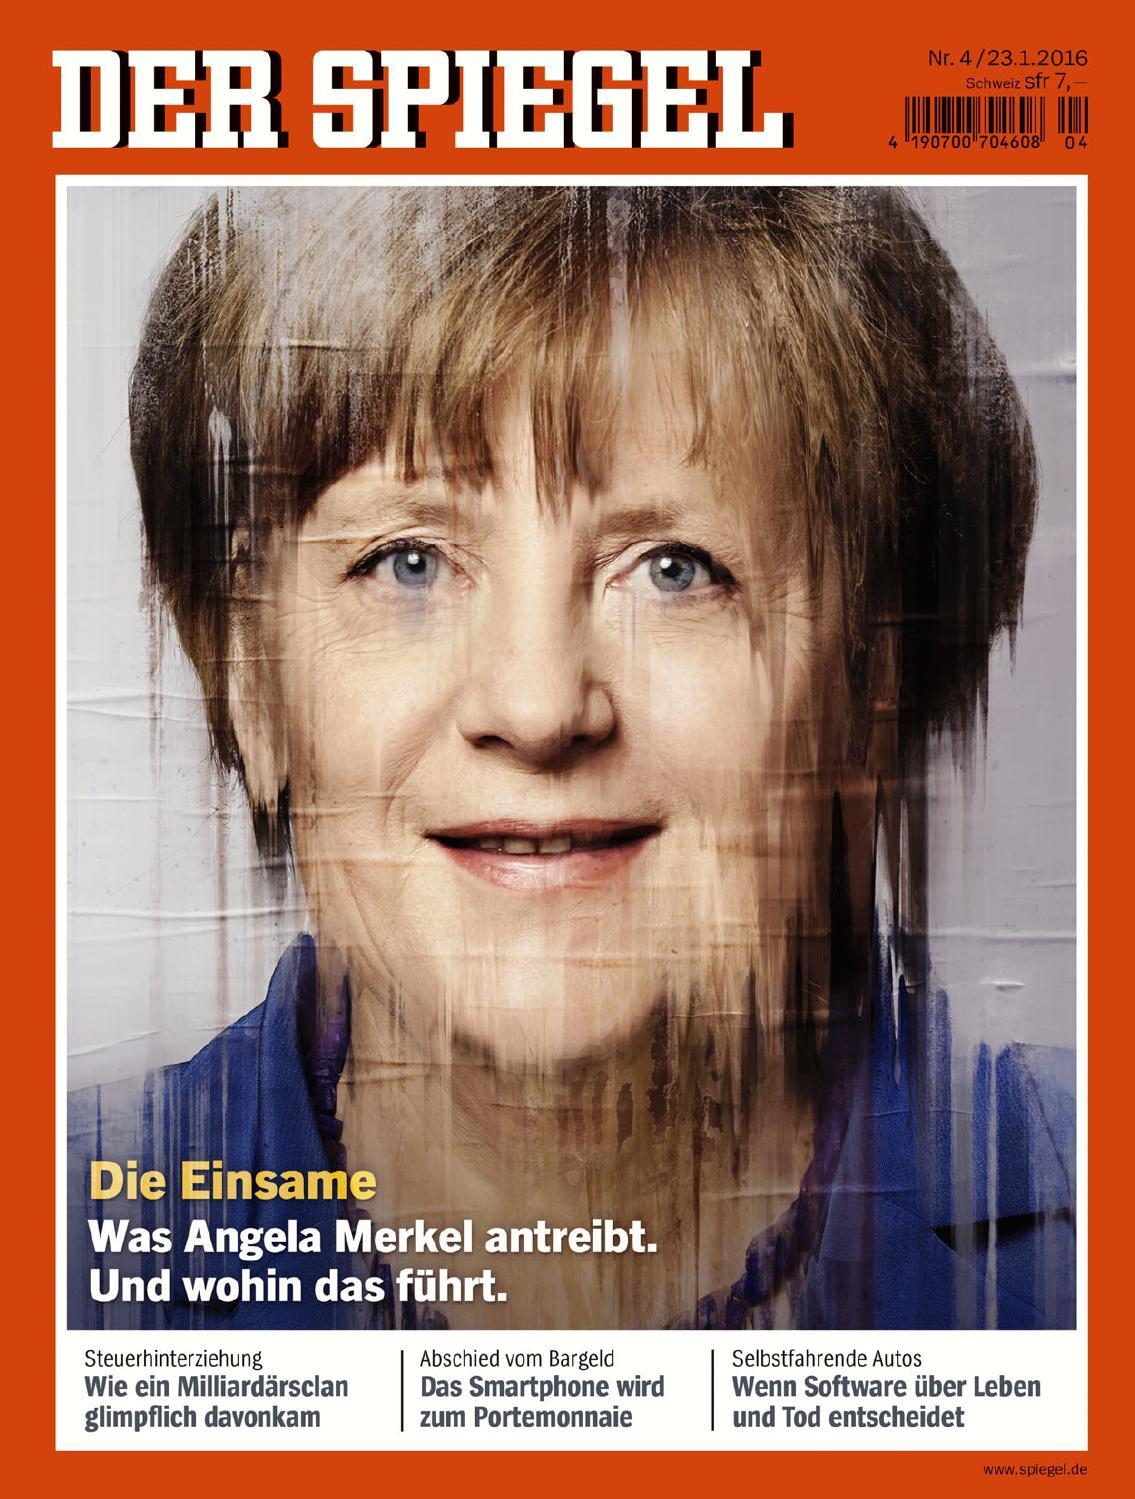 Michelle Pfifferench Audition Porn der spiegel nr 4, 23 januar 2016http://webinarjeo-review